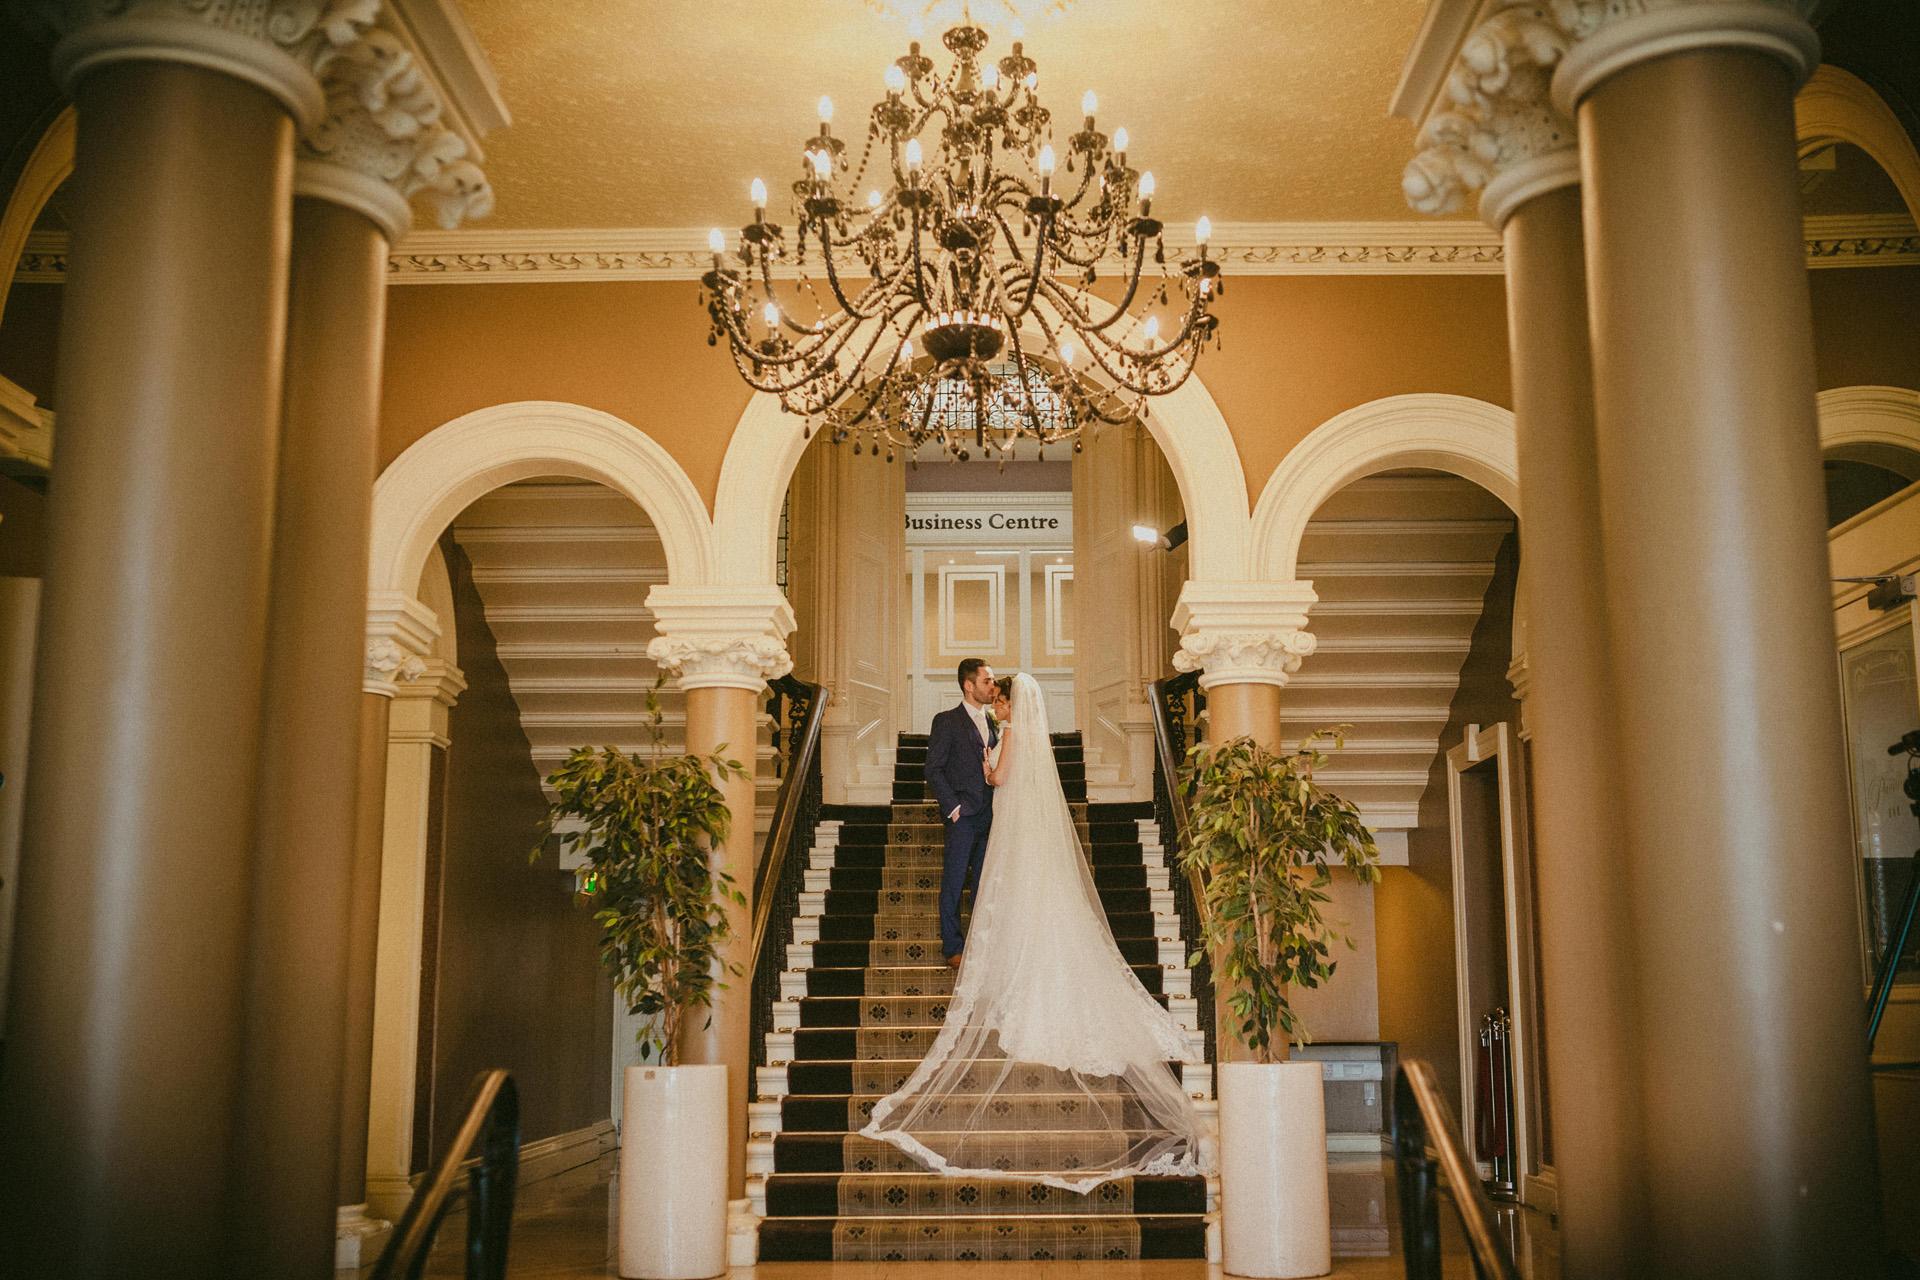 Royal-marine-hotel-wedding-photos6